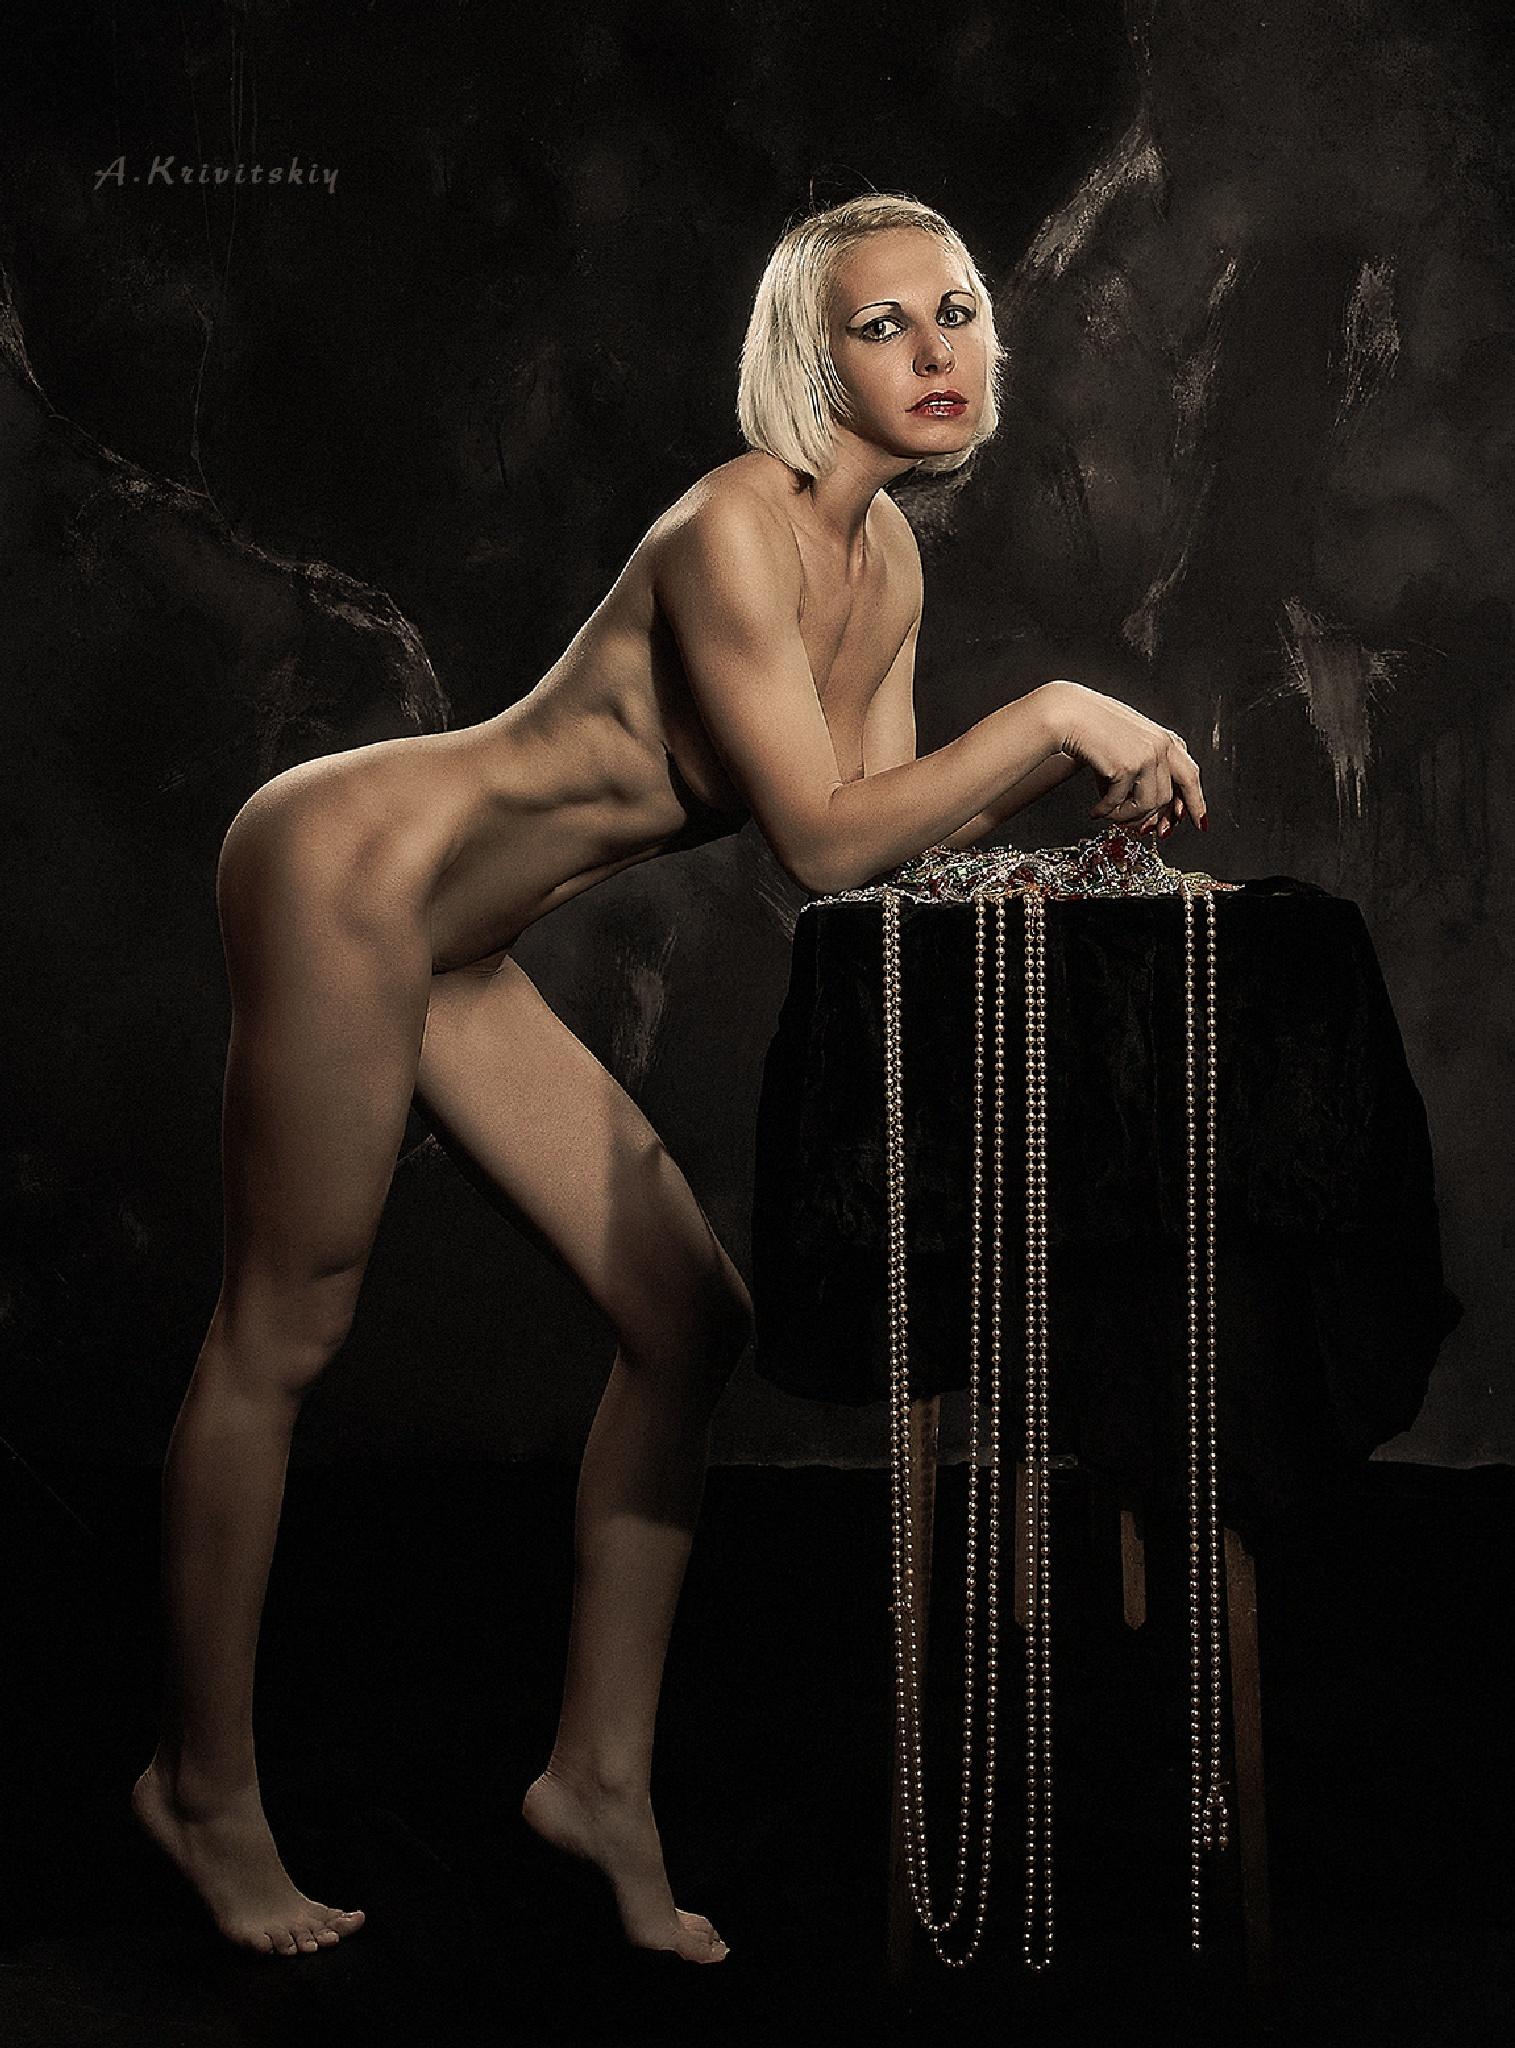 Nude woman, studio. by krivitskiy